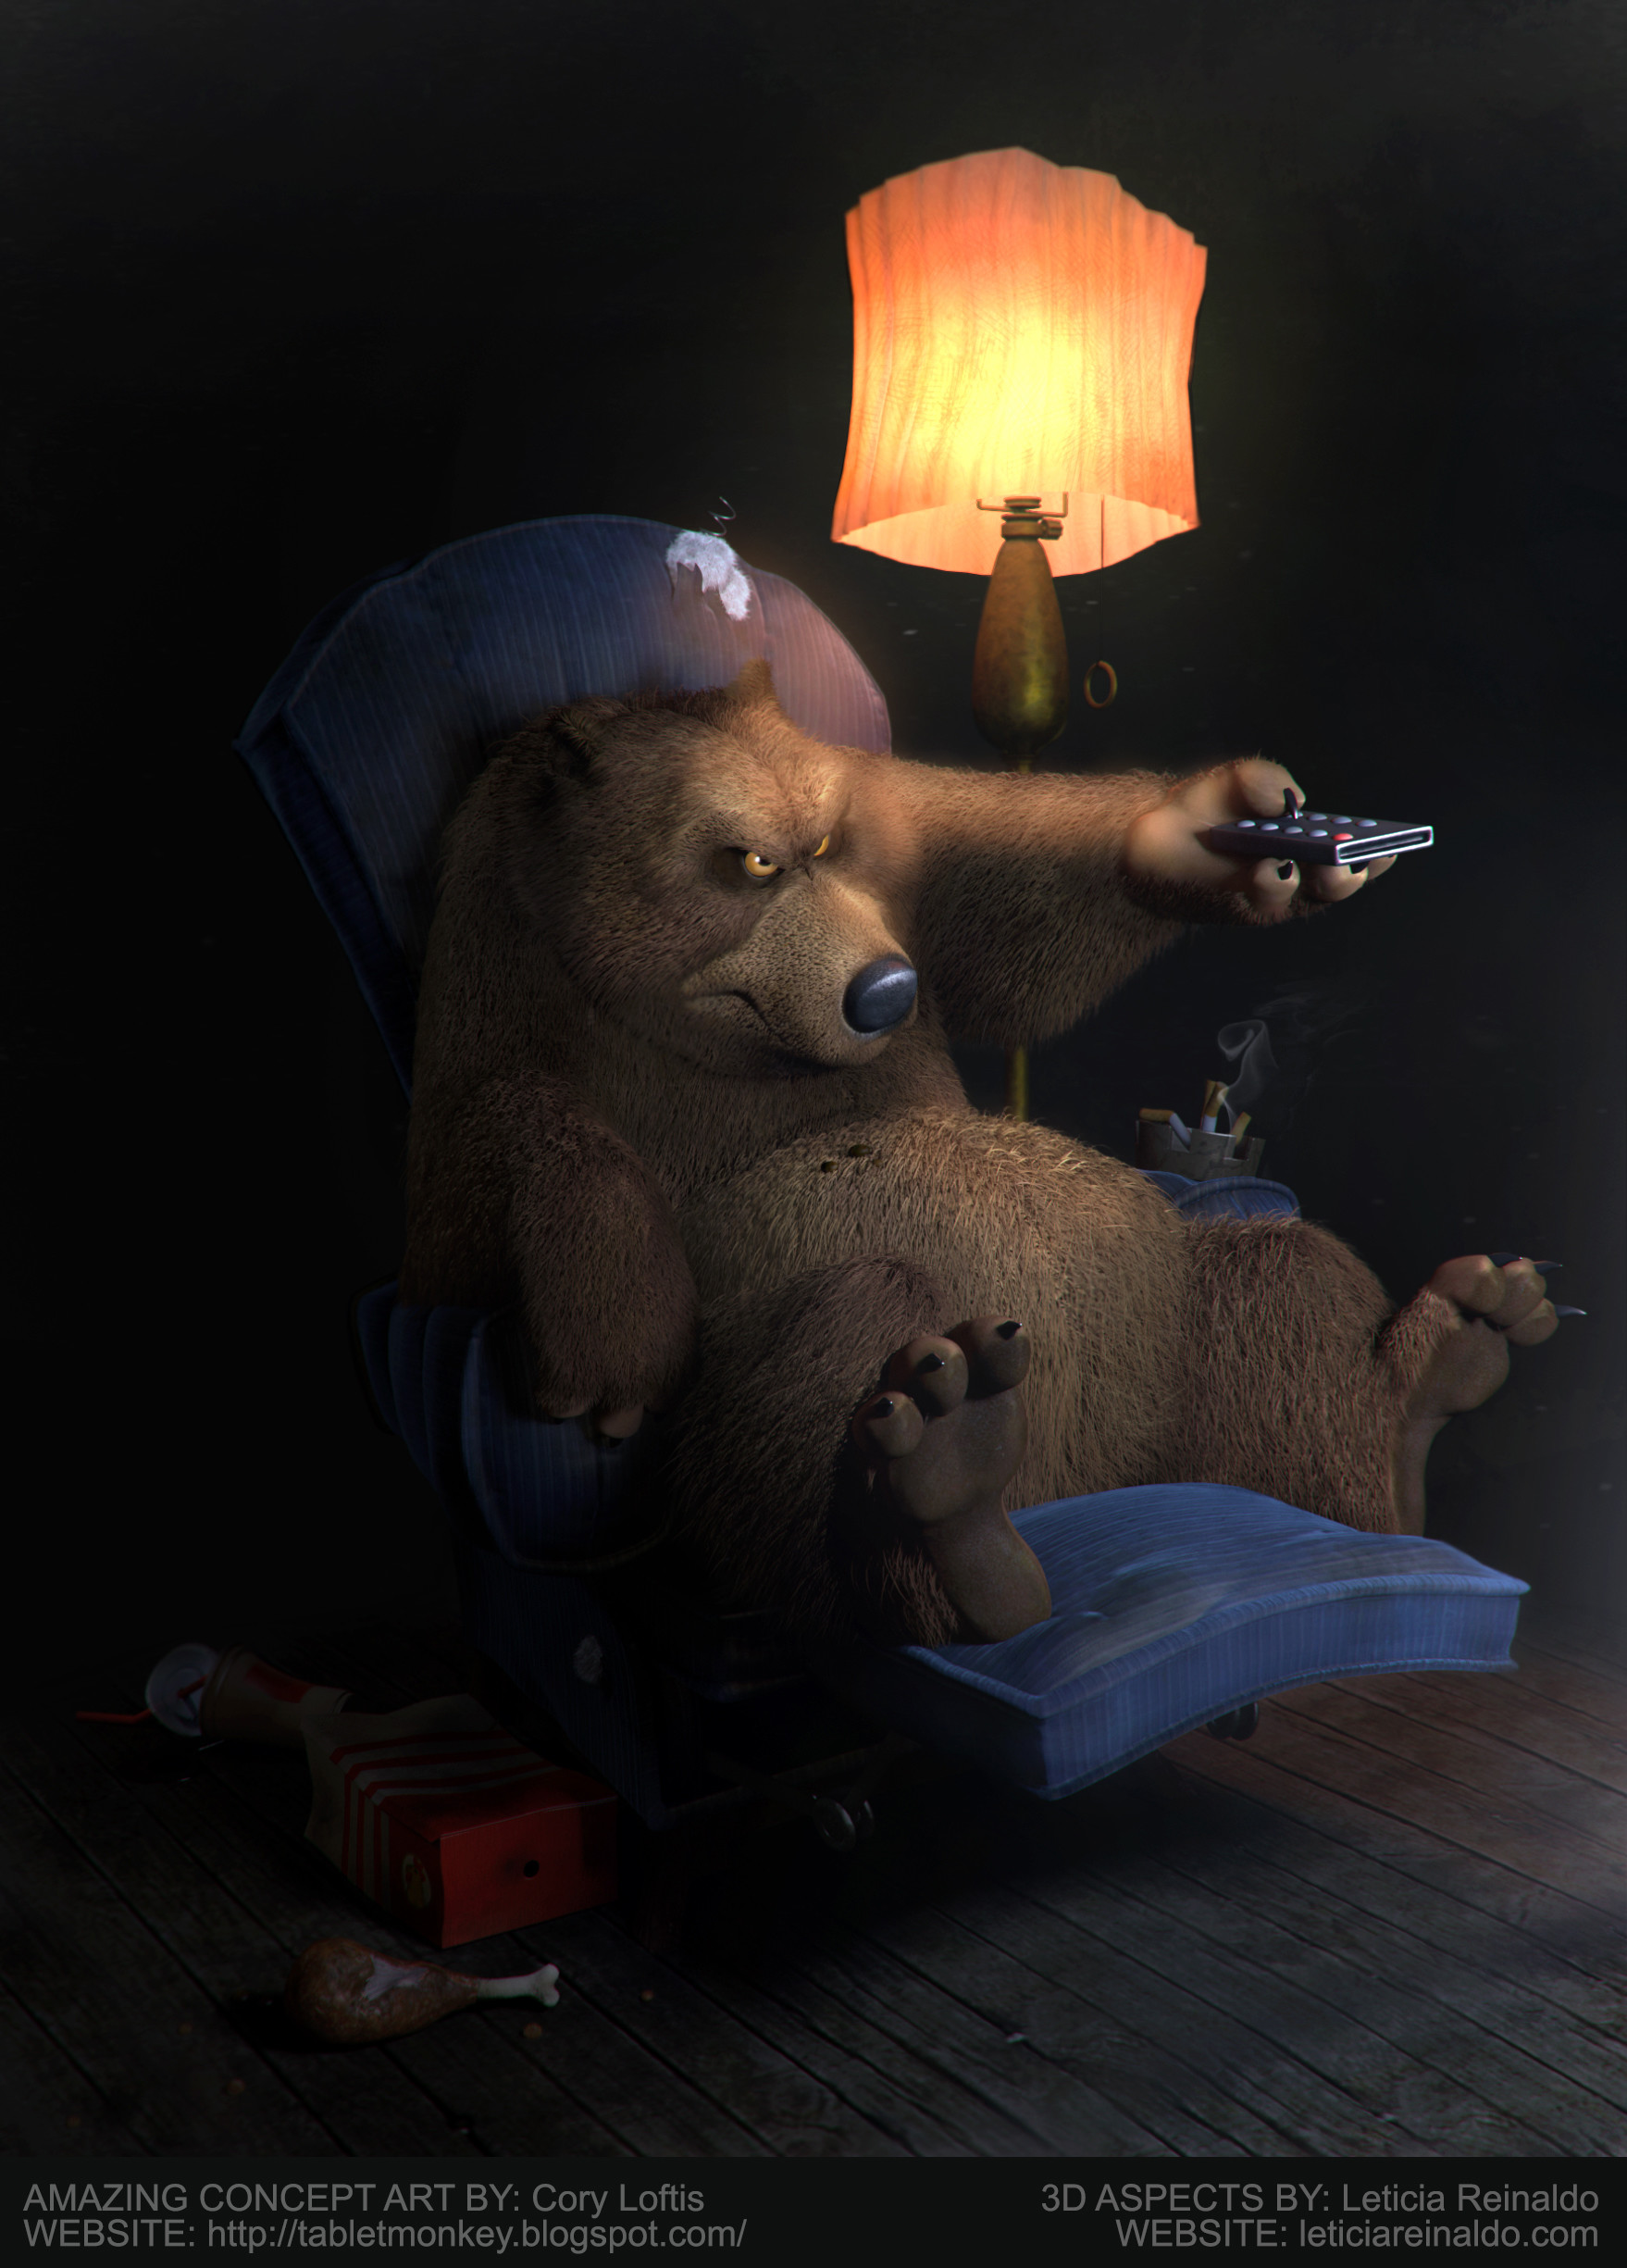 Leticia reinaldo gillett leticiar bear final credits